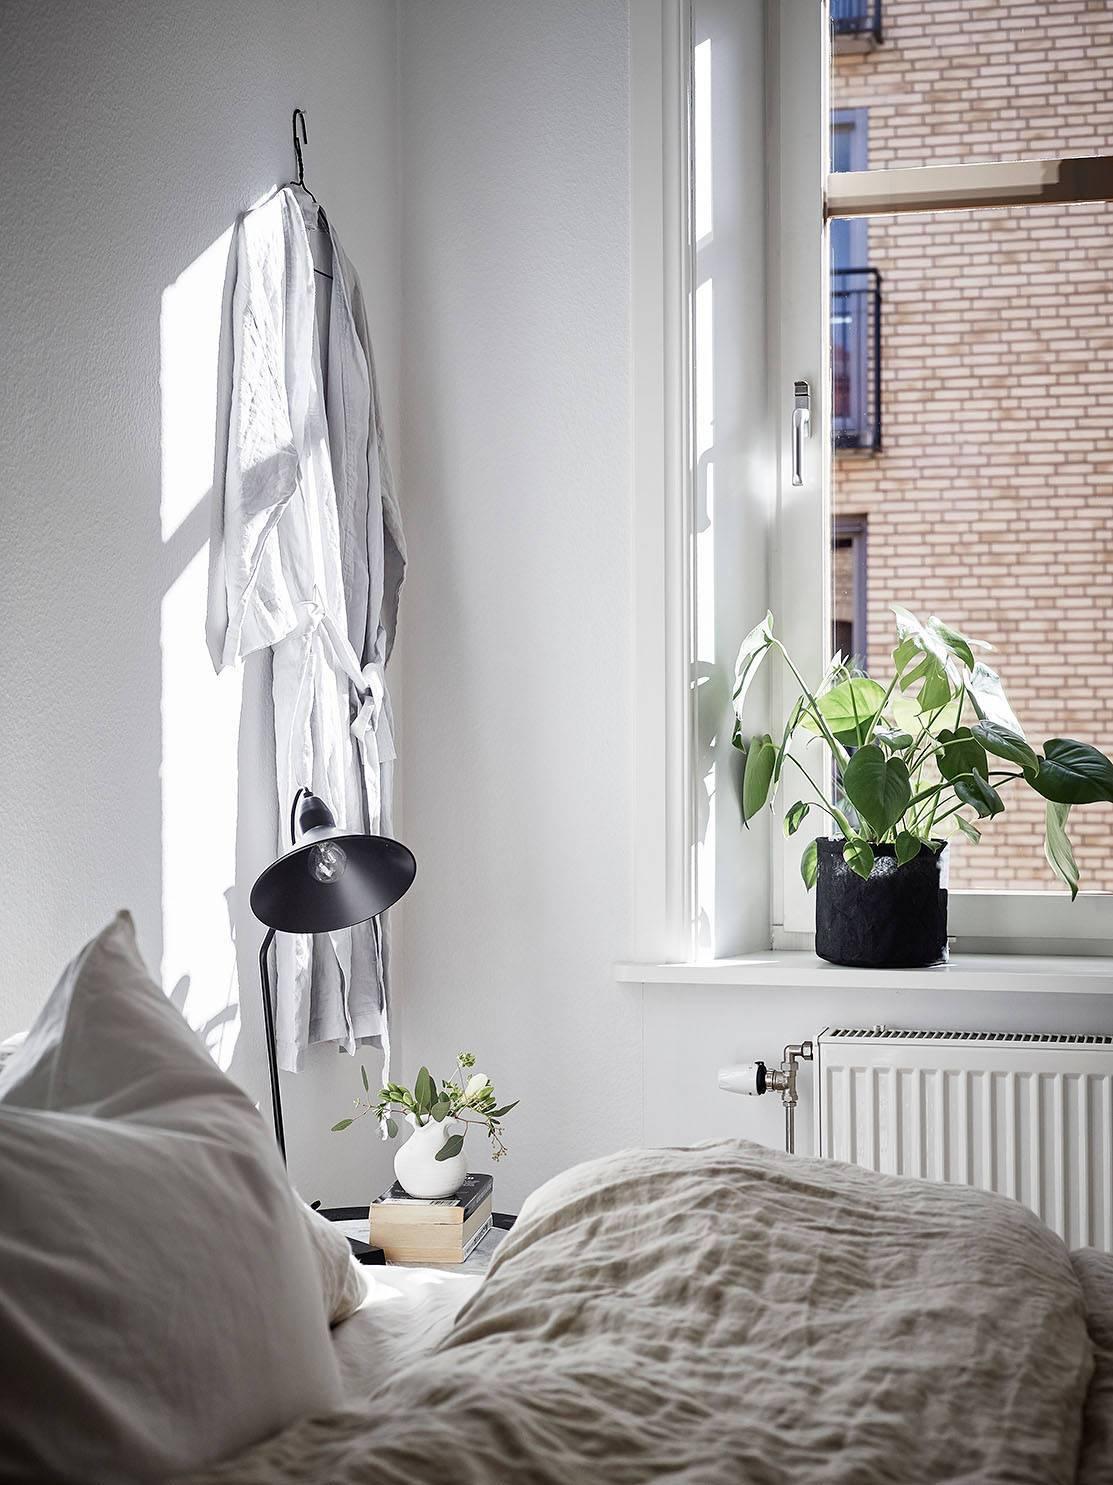 Interior Envy: Inspiring Minimal Bedrooms Monochrome Interior Blog